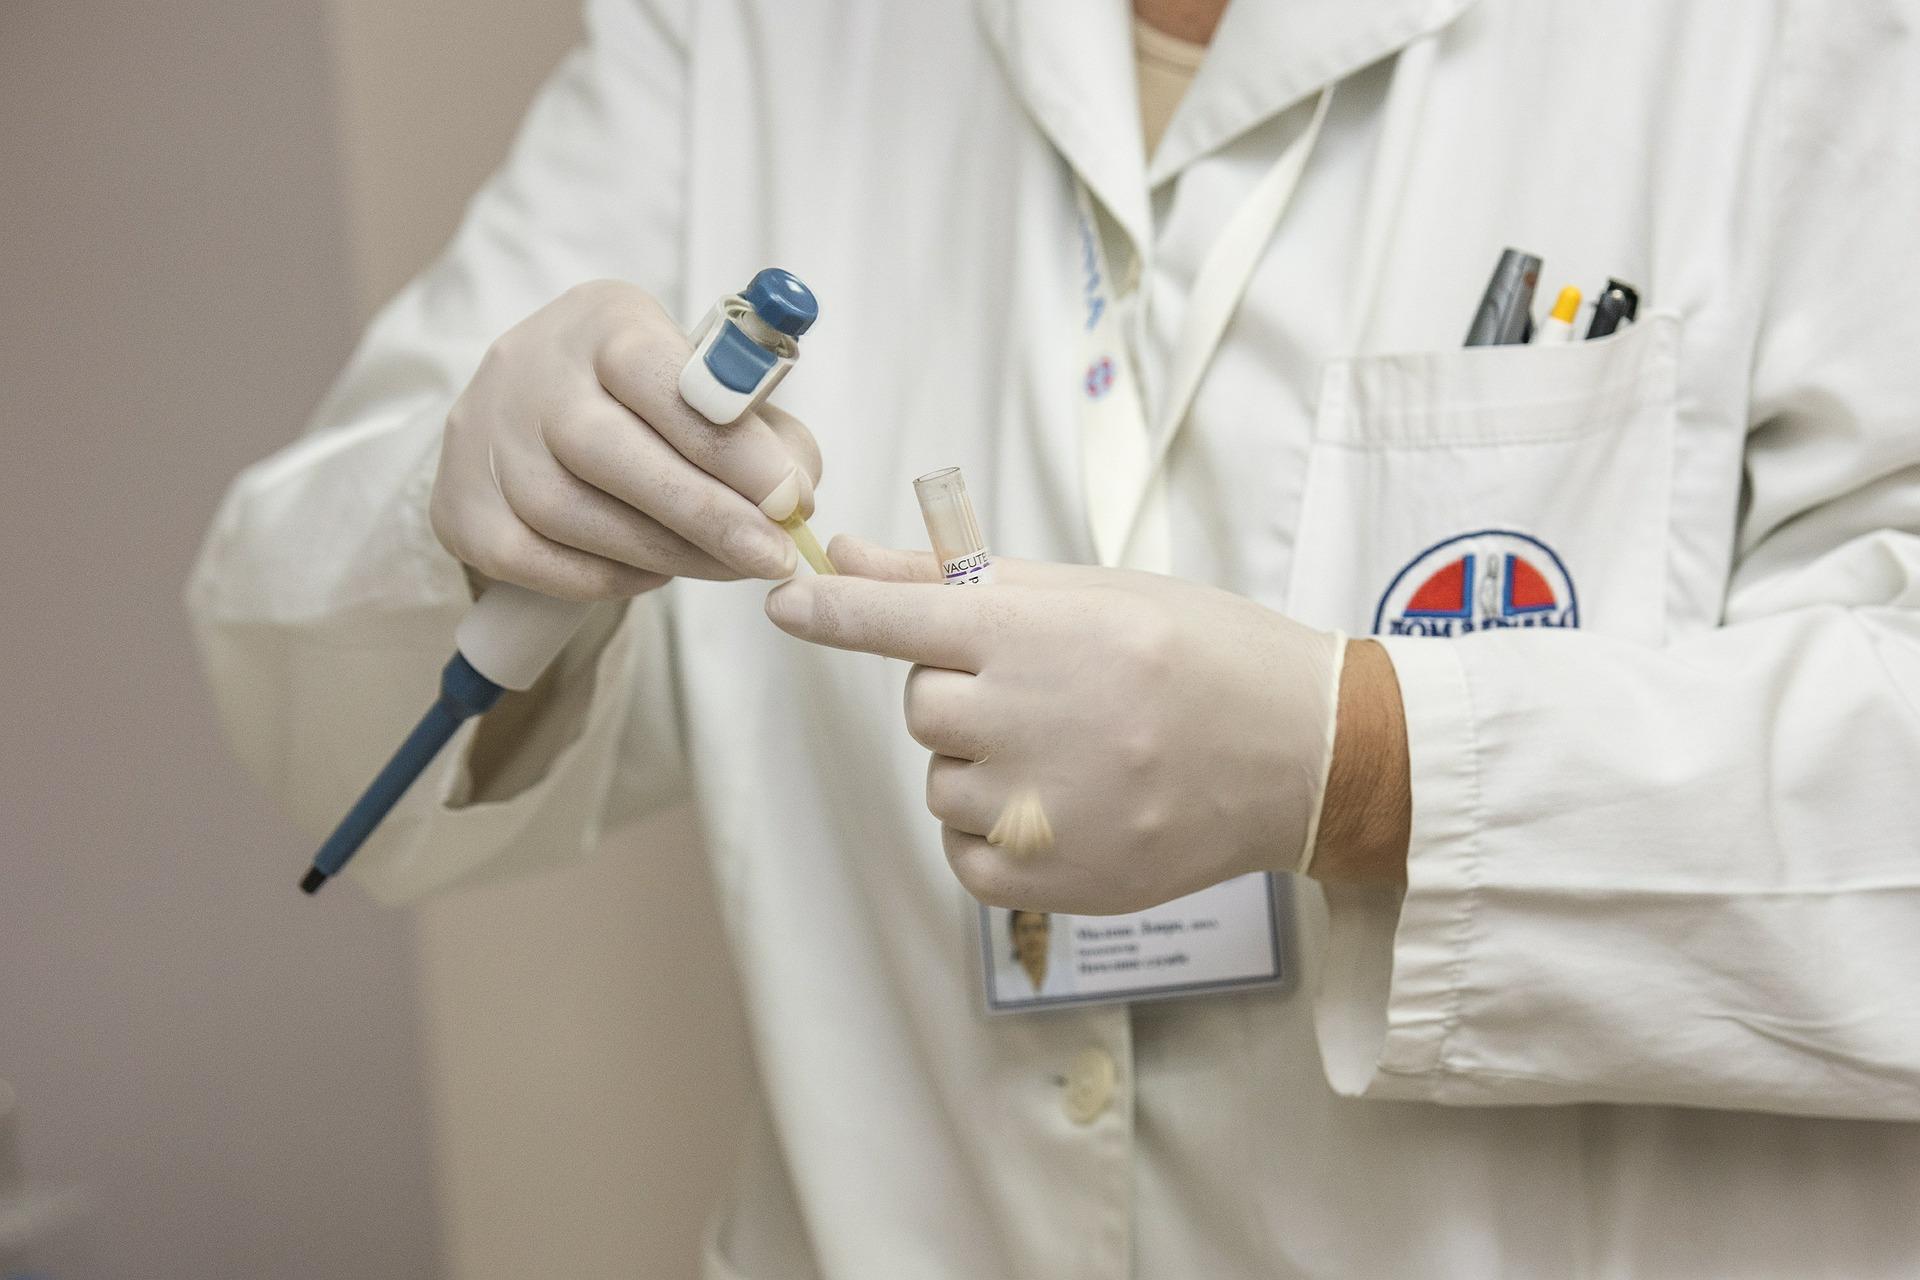 Outpatient Lab testing